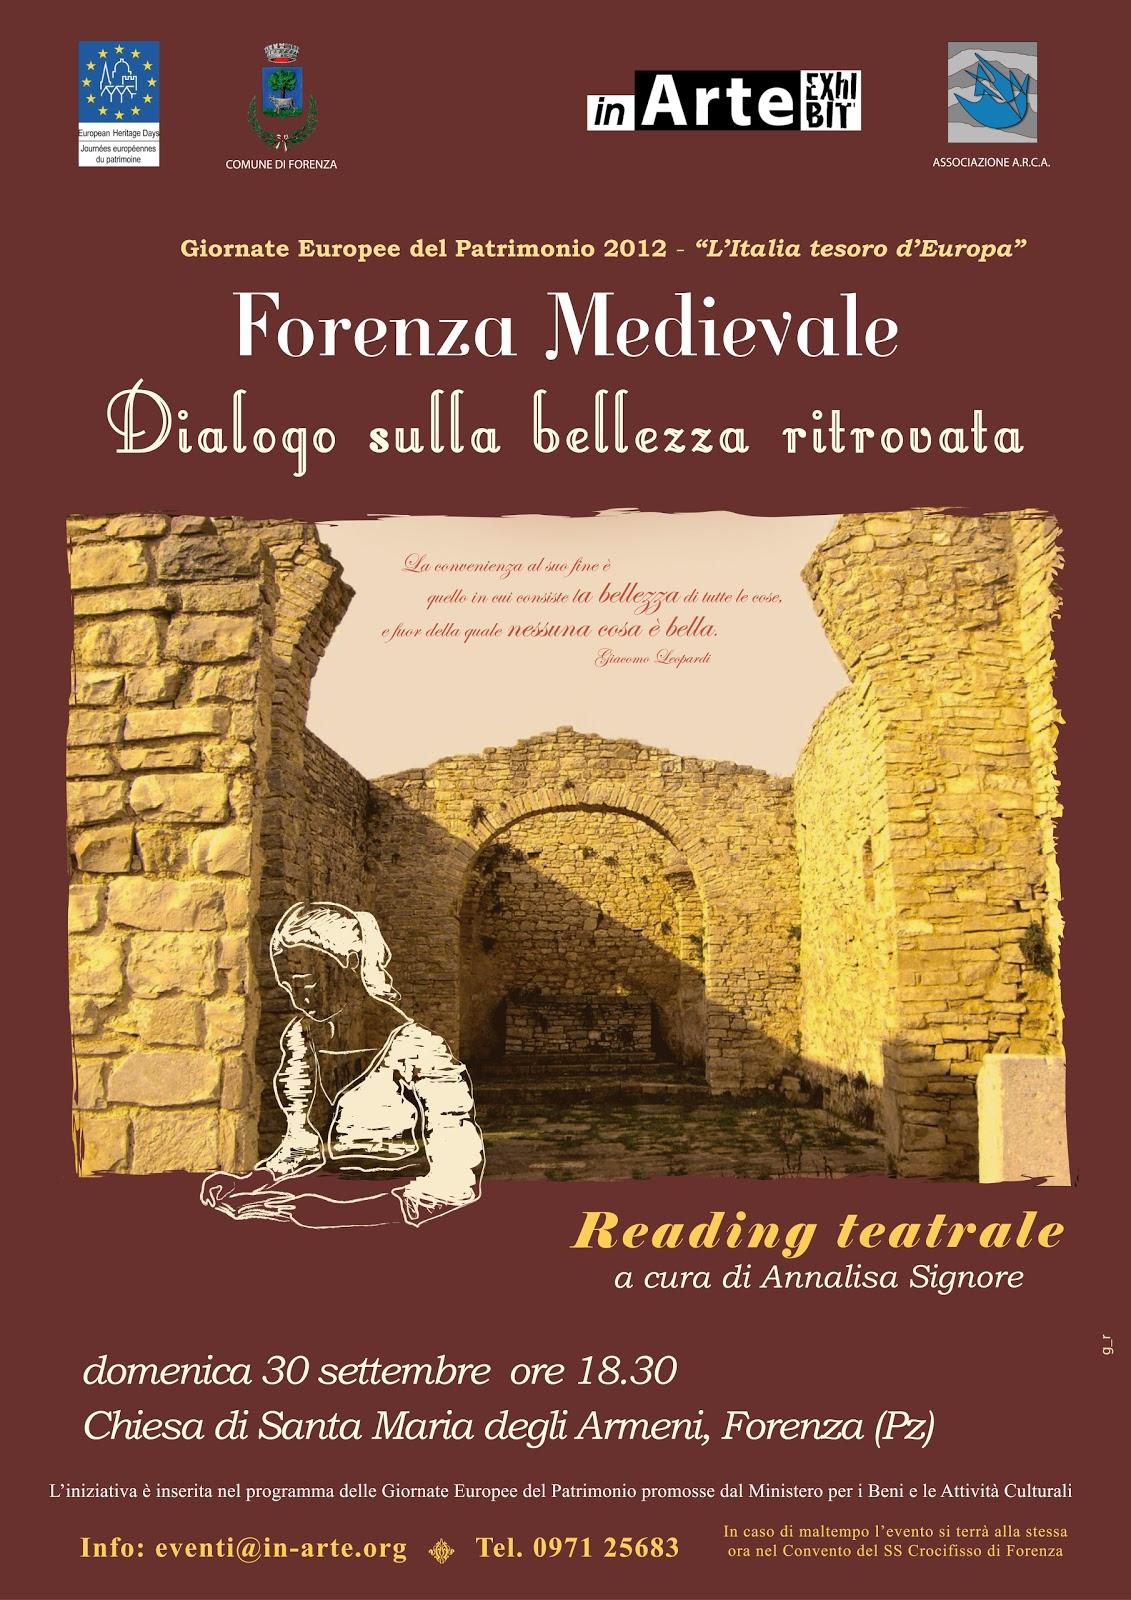 http://inarte-blog.blogspot.it/2012/09/forenza-medievale-dialogo-sulla.html